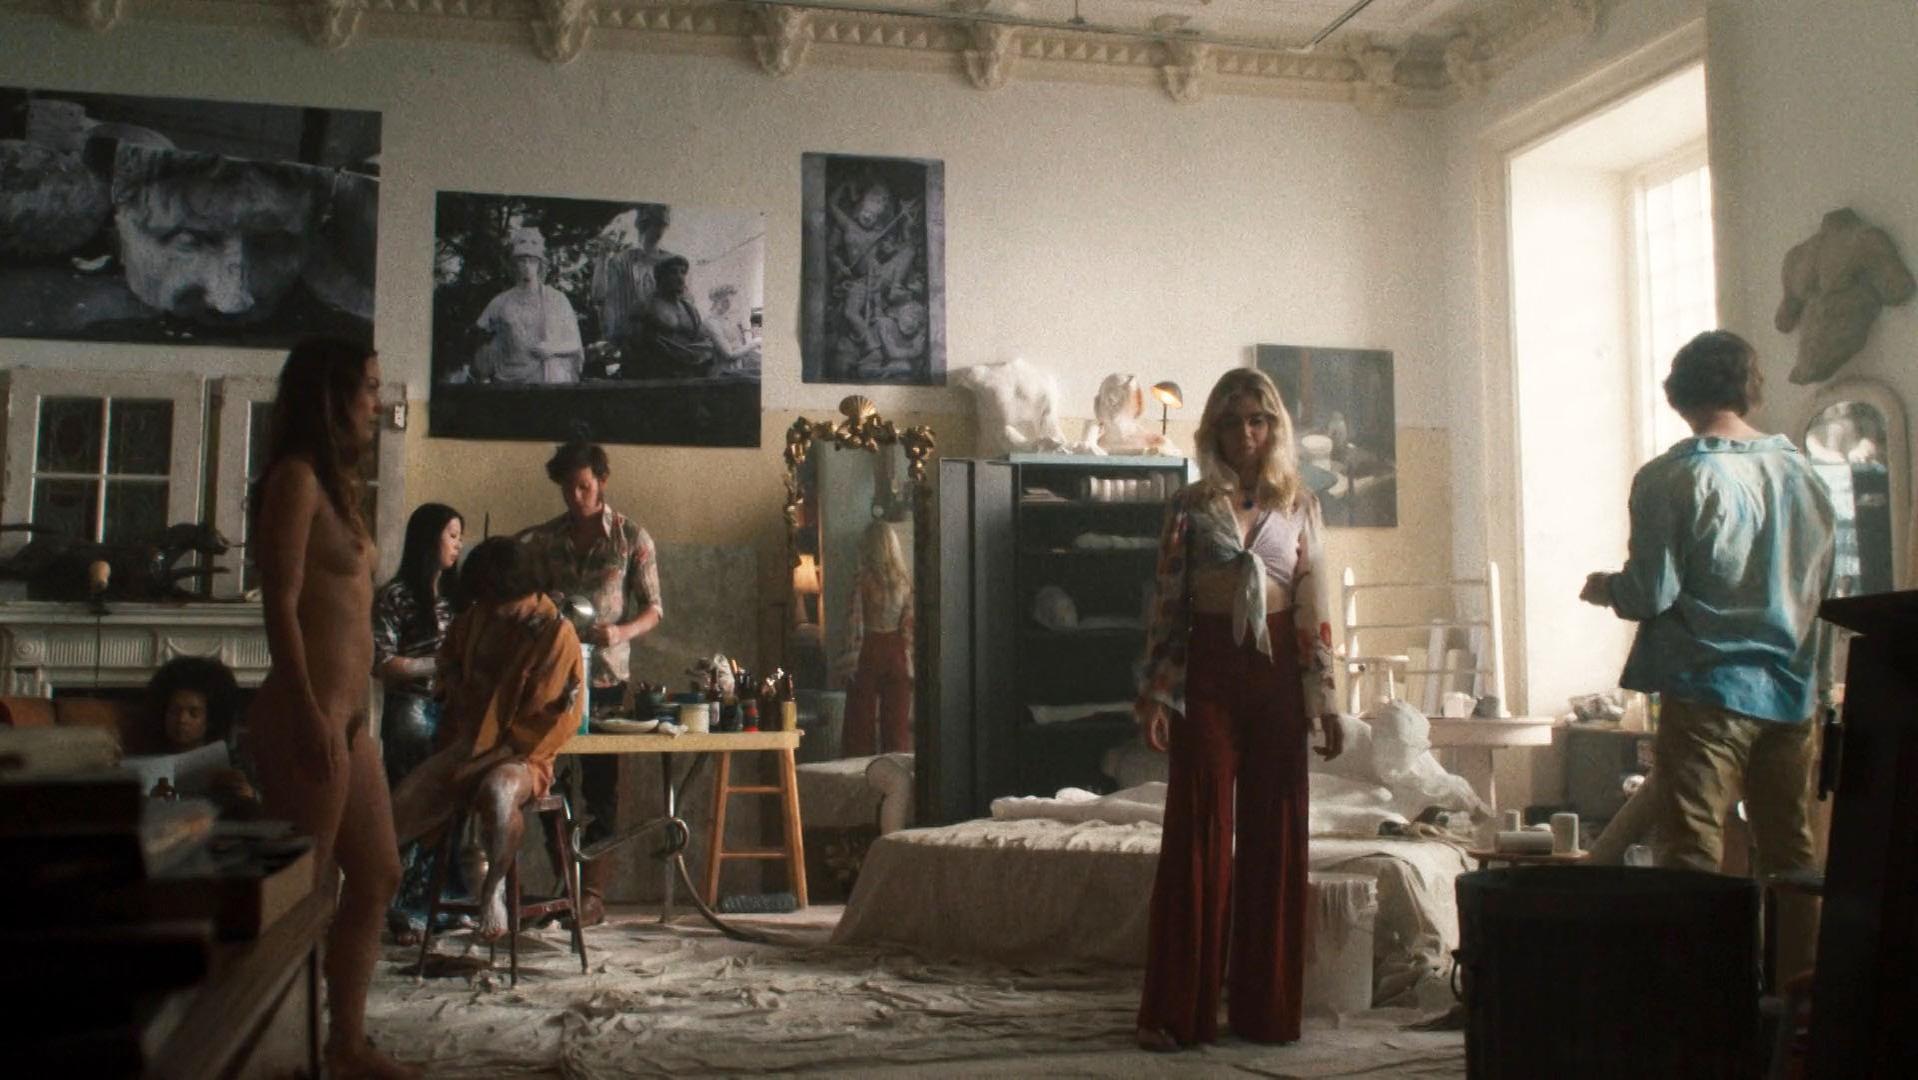 Olivia Wilde nude - Vinyl s01e06 (2016)